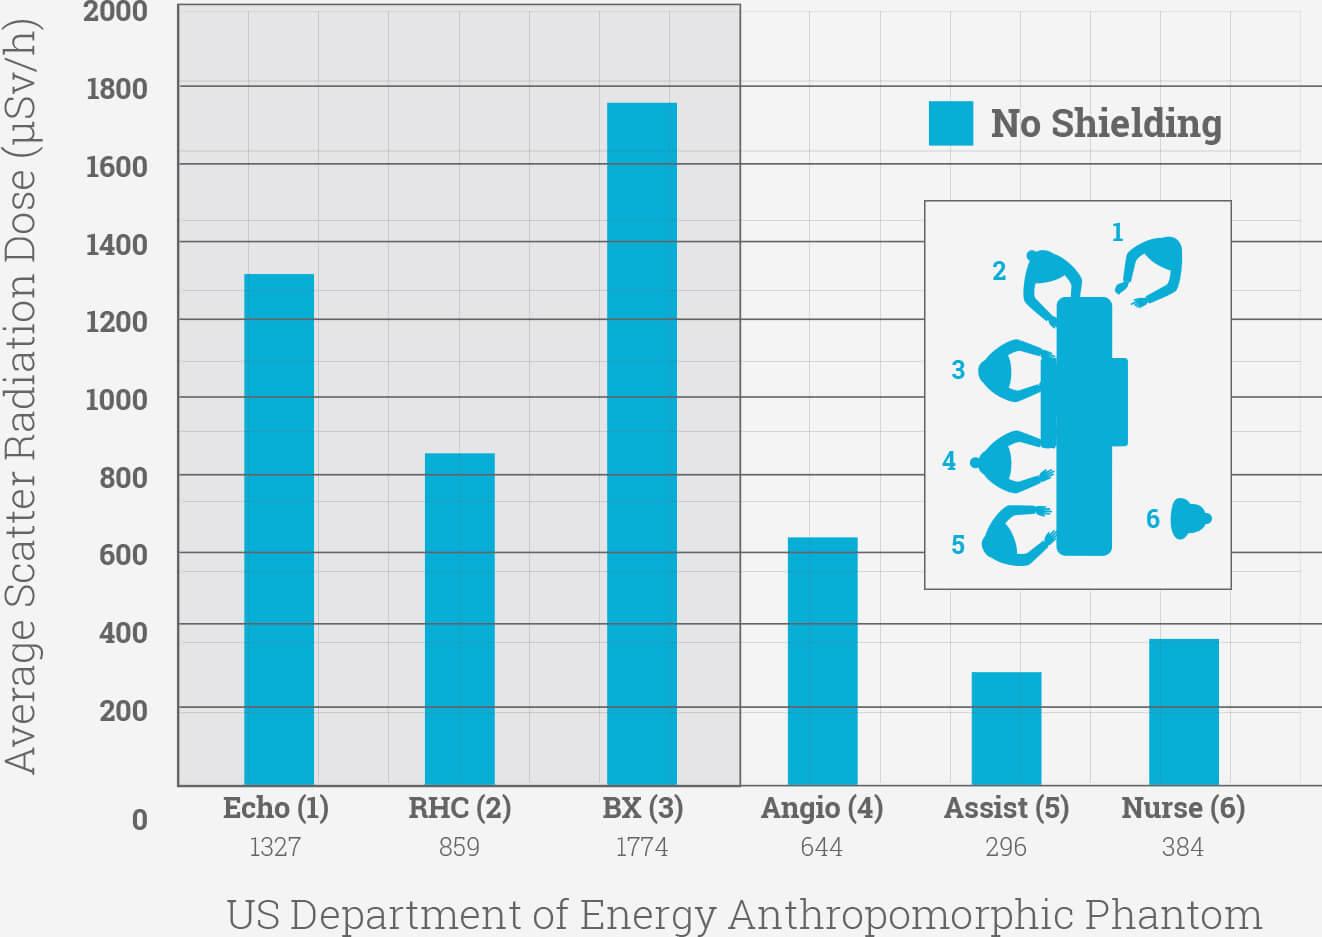 Radiation Exposure No Shielding